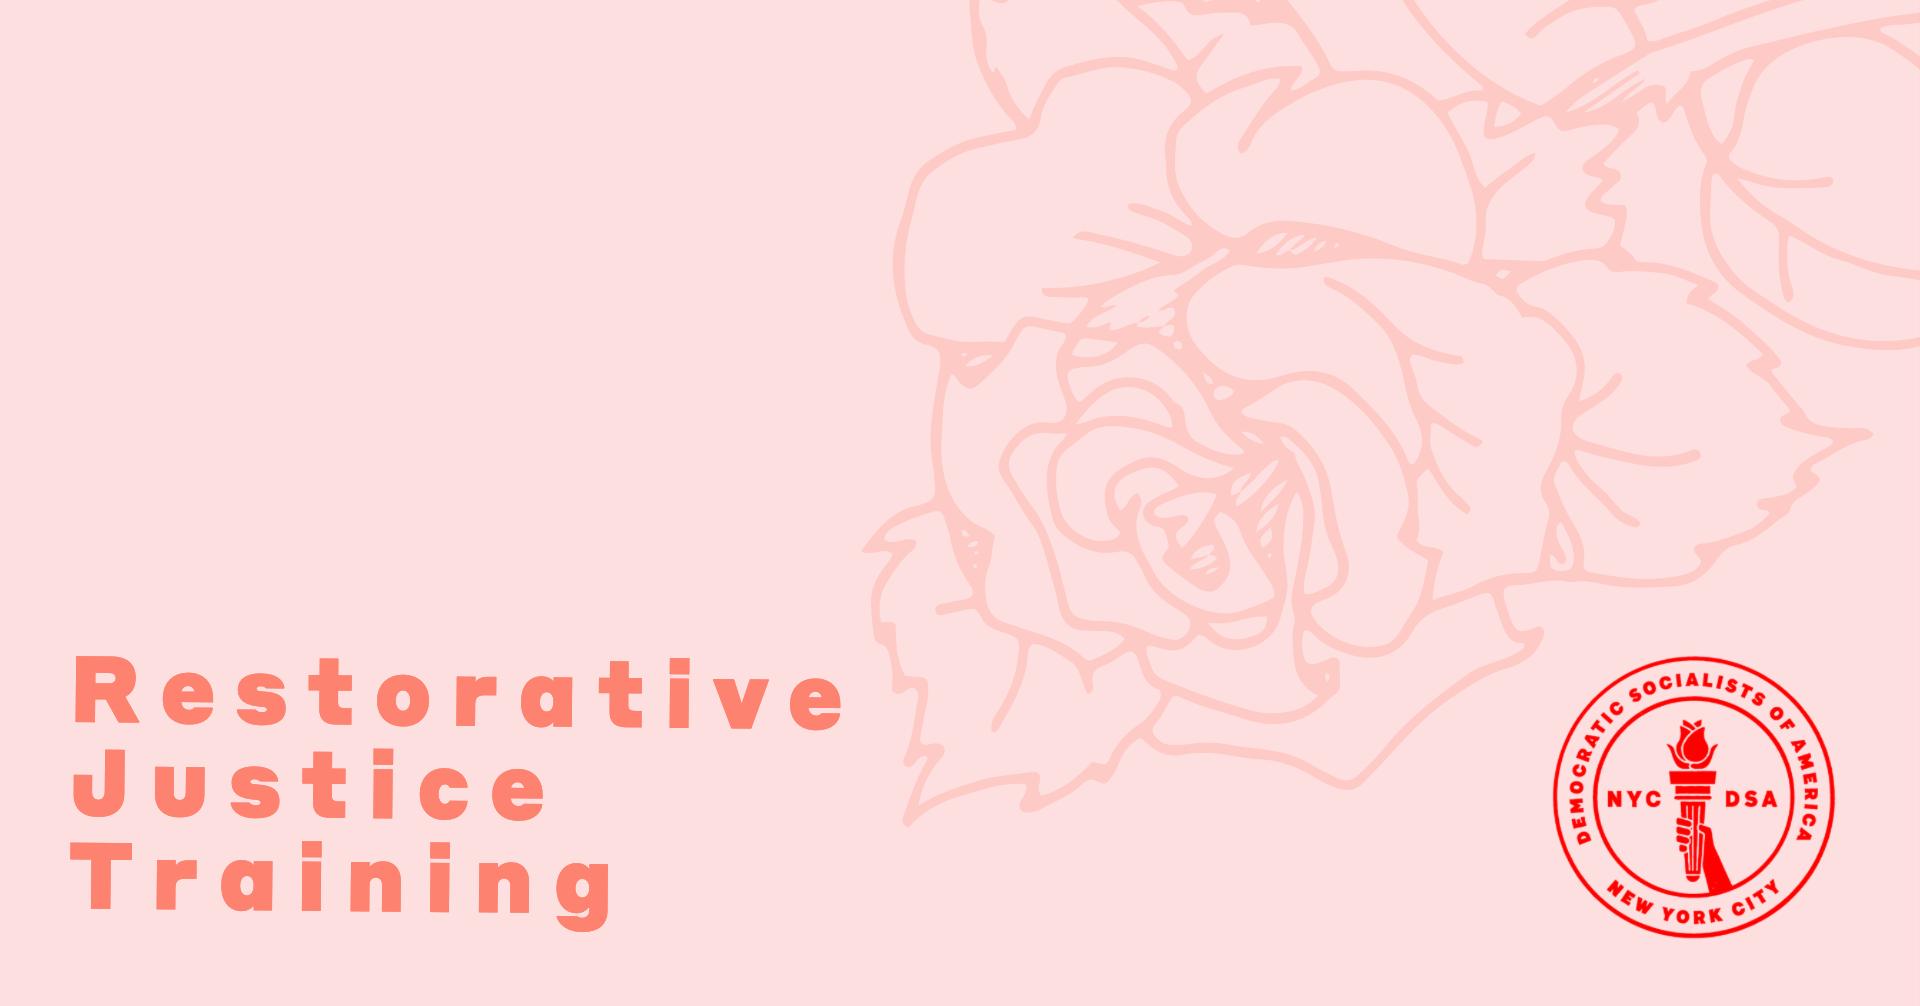 RestorativeJusticeTraining.png